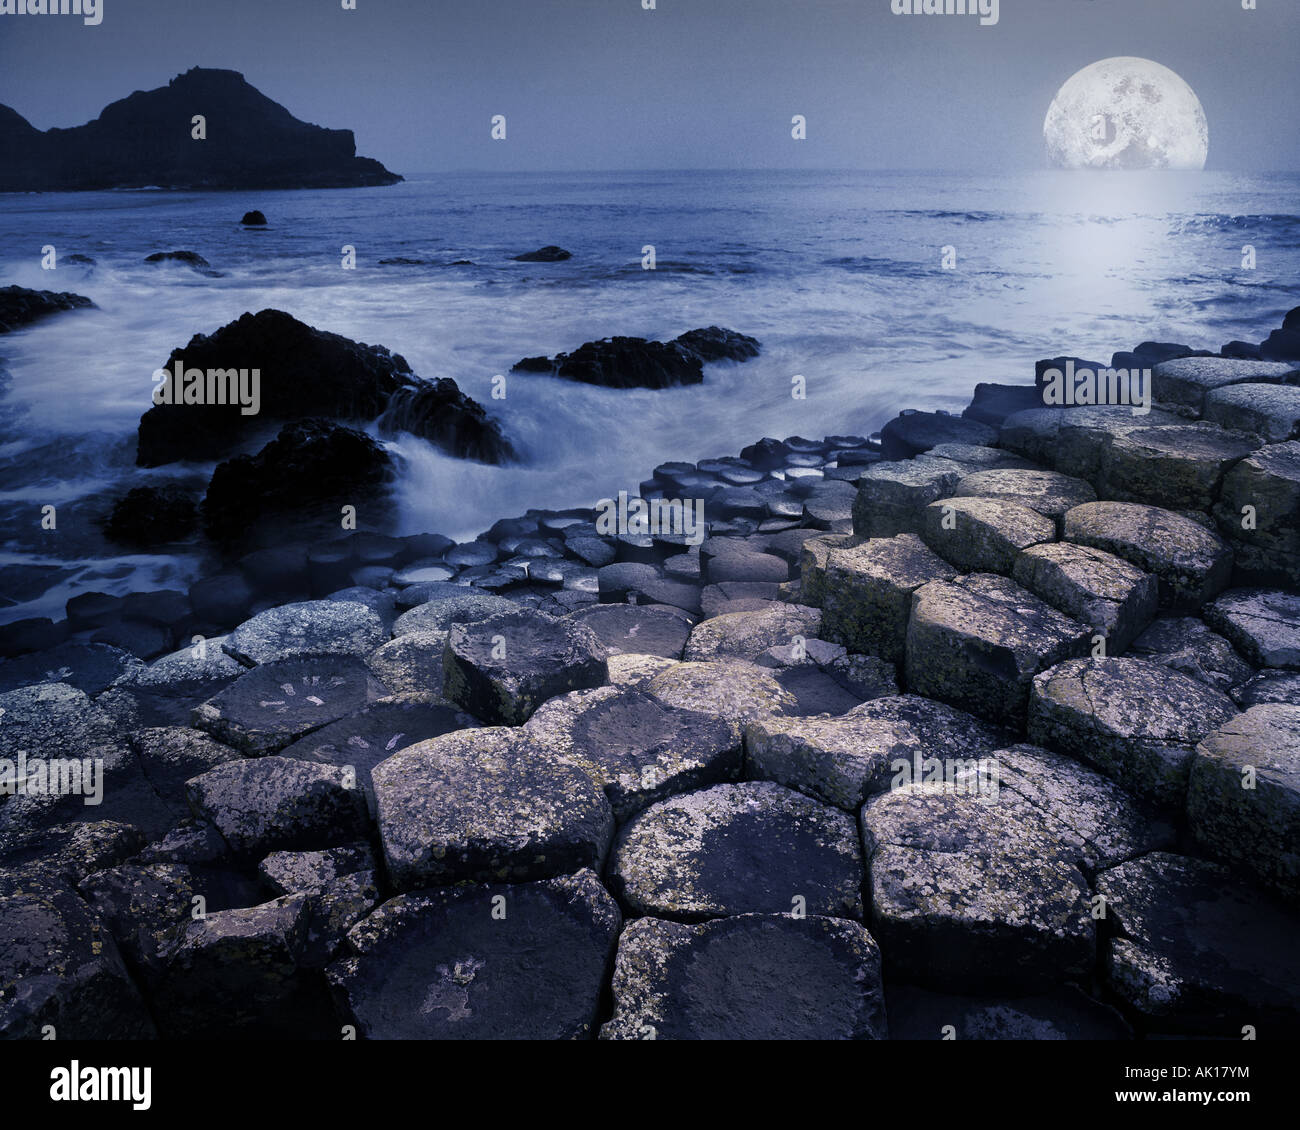 GB - Nordirland: Mond am Giant's Causeway Stockbild